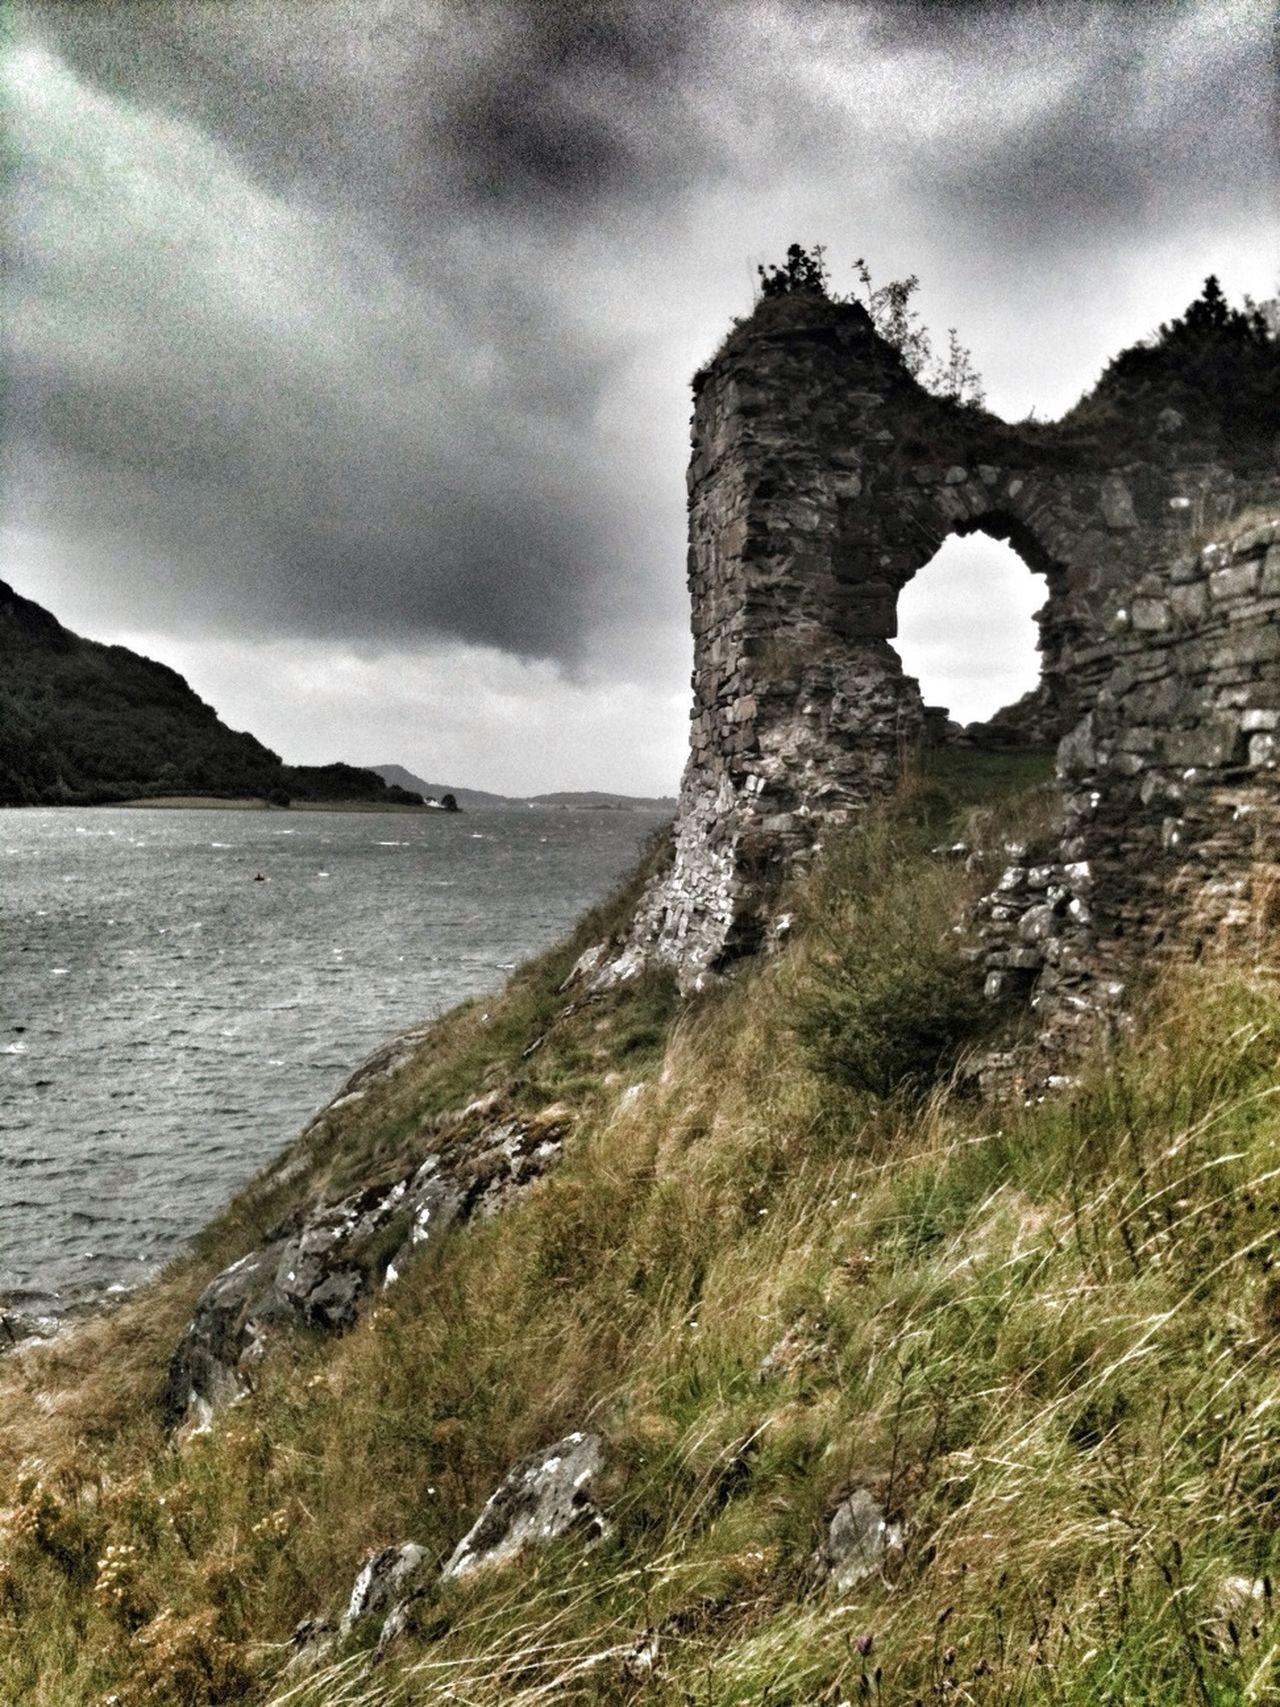 Strome castle, Highlands of Scotland